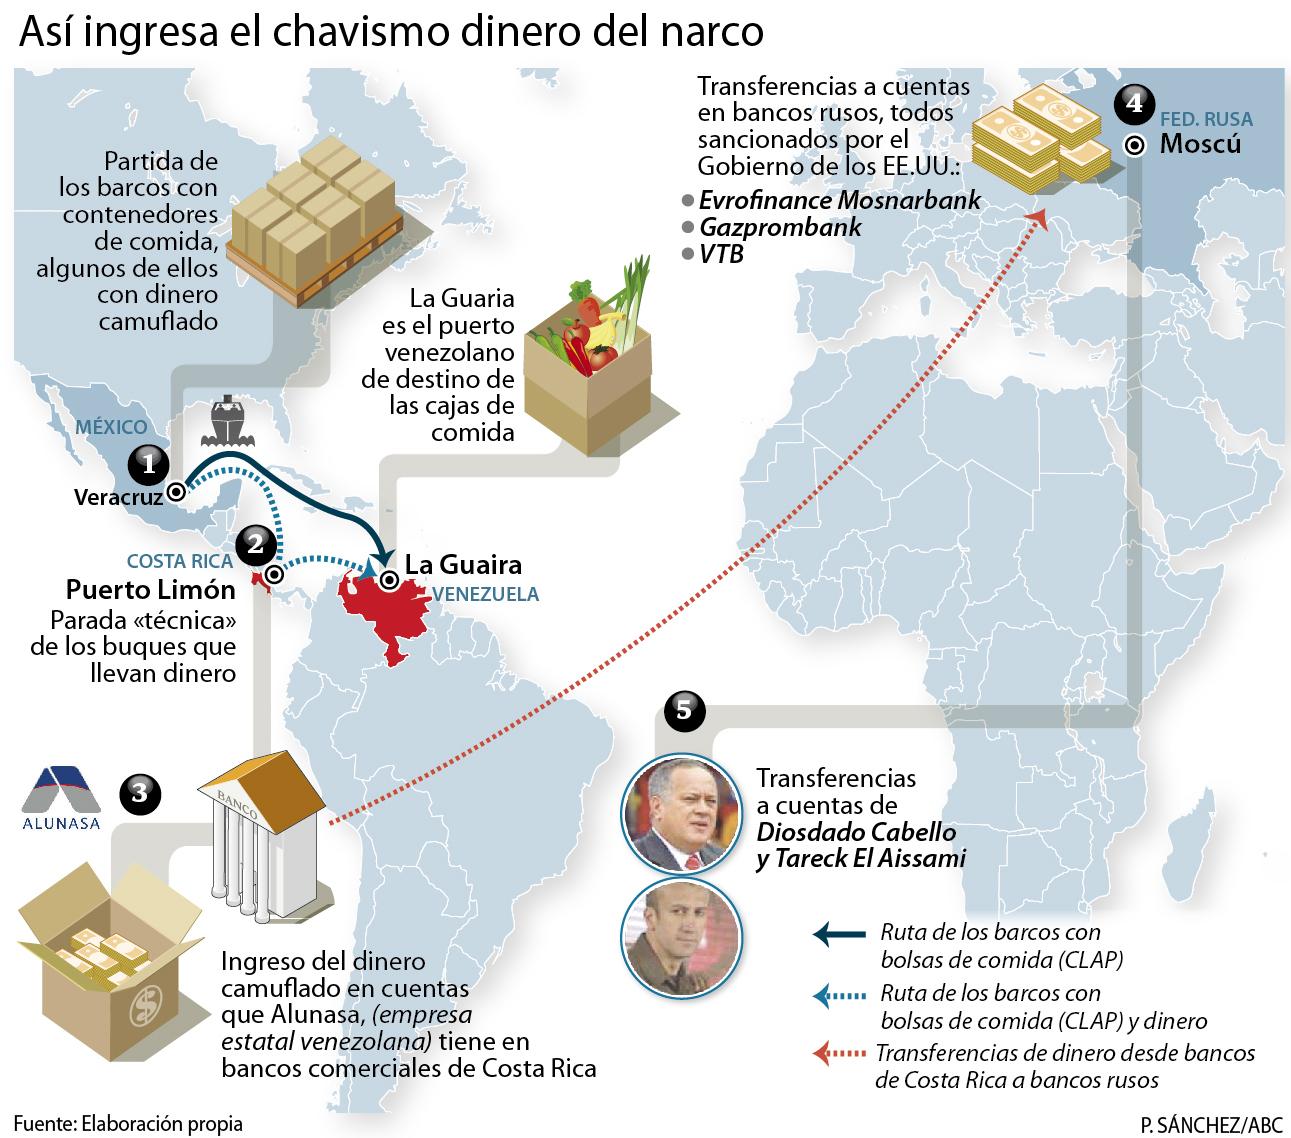 Tirania de Nicolas Maduro - Página 11 Ruta-dinero-narco--620x550